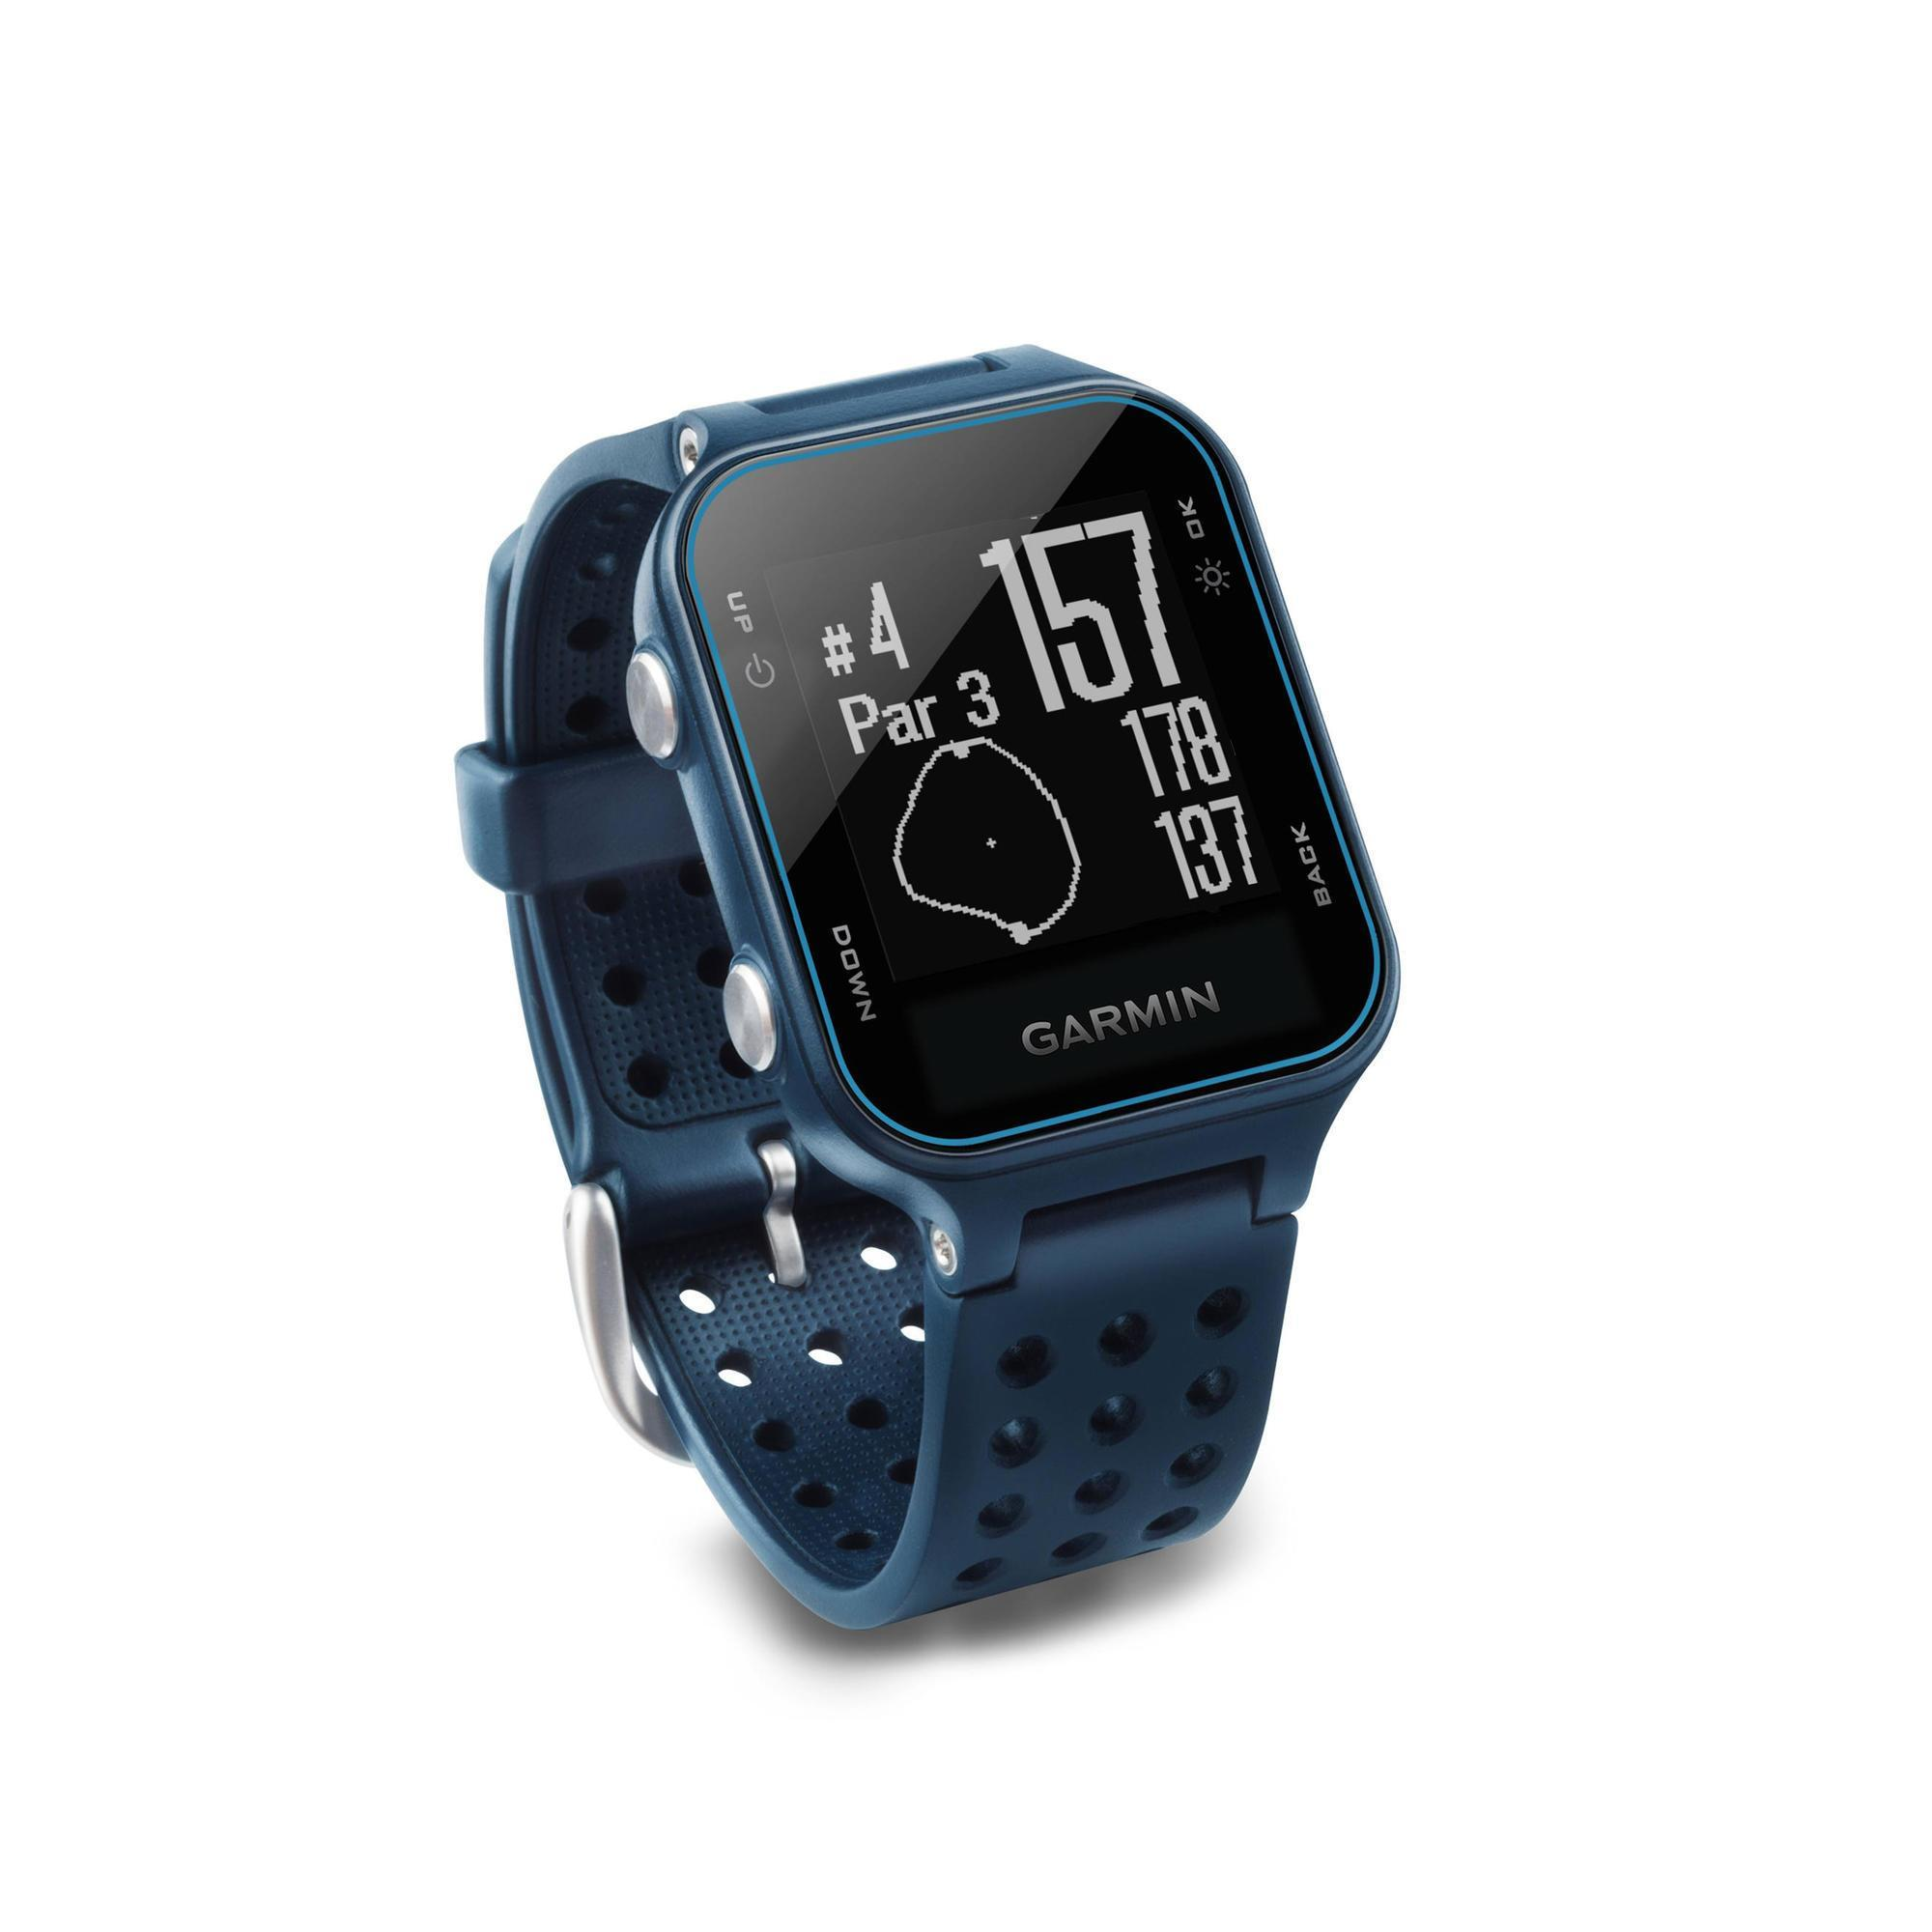 Comprar Relojes Gps Deportivos online  83485a545329